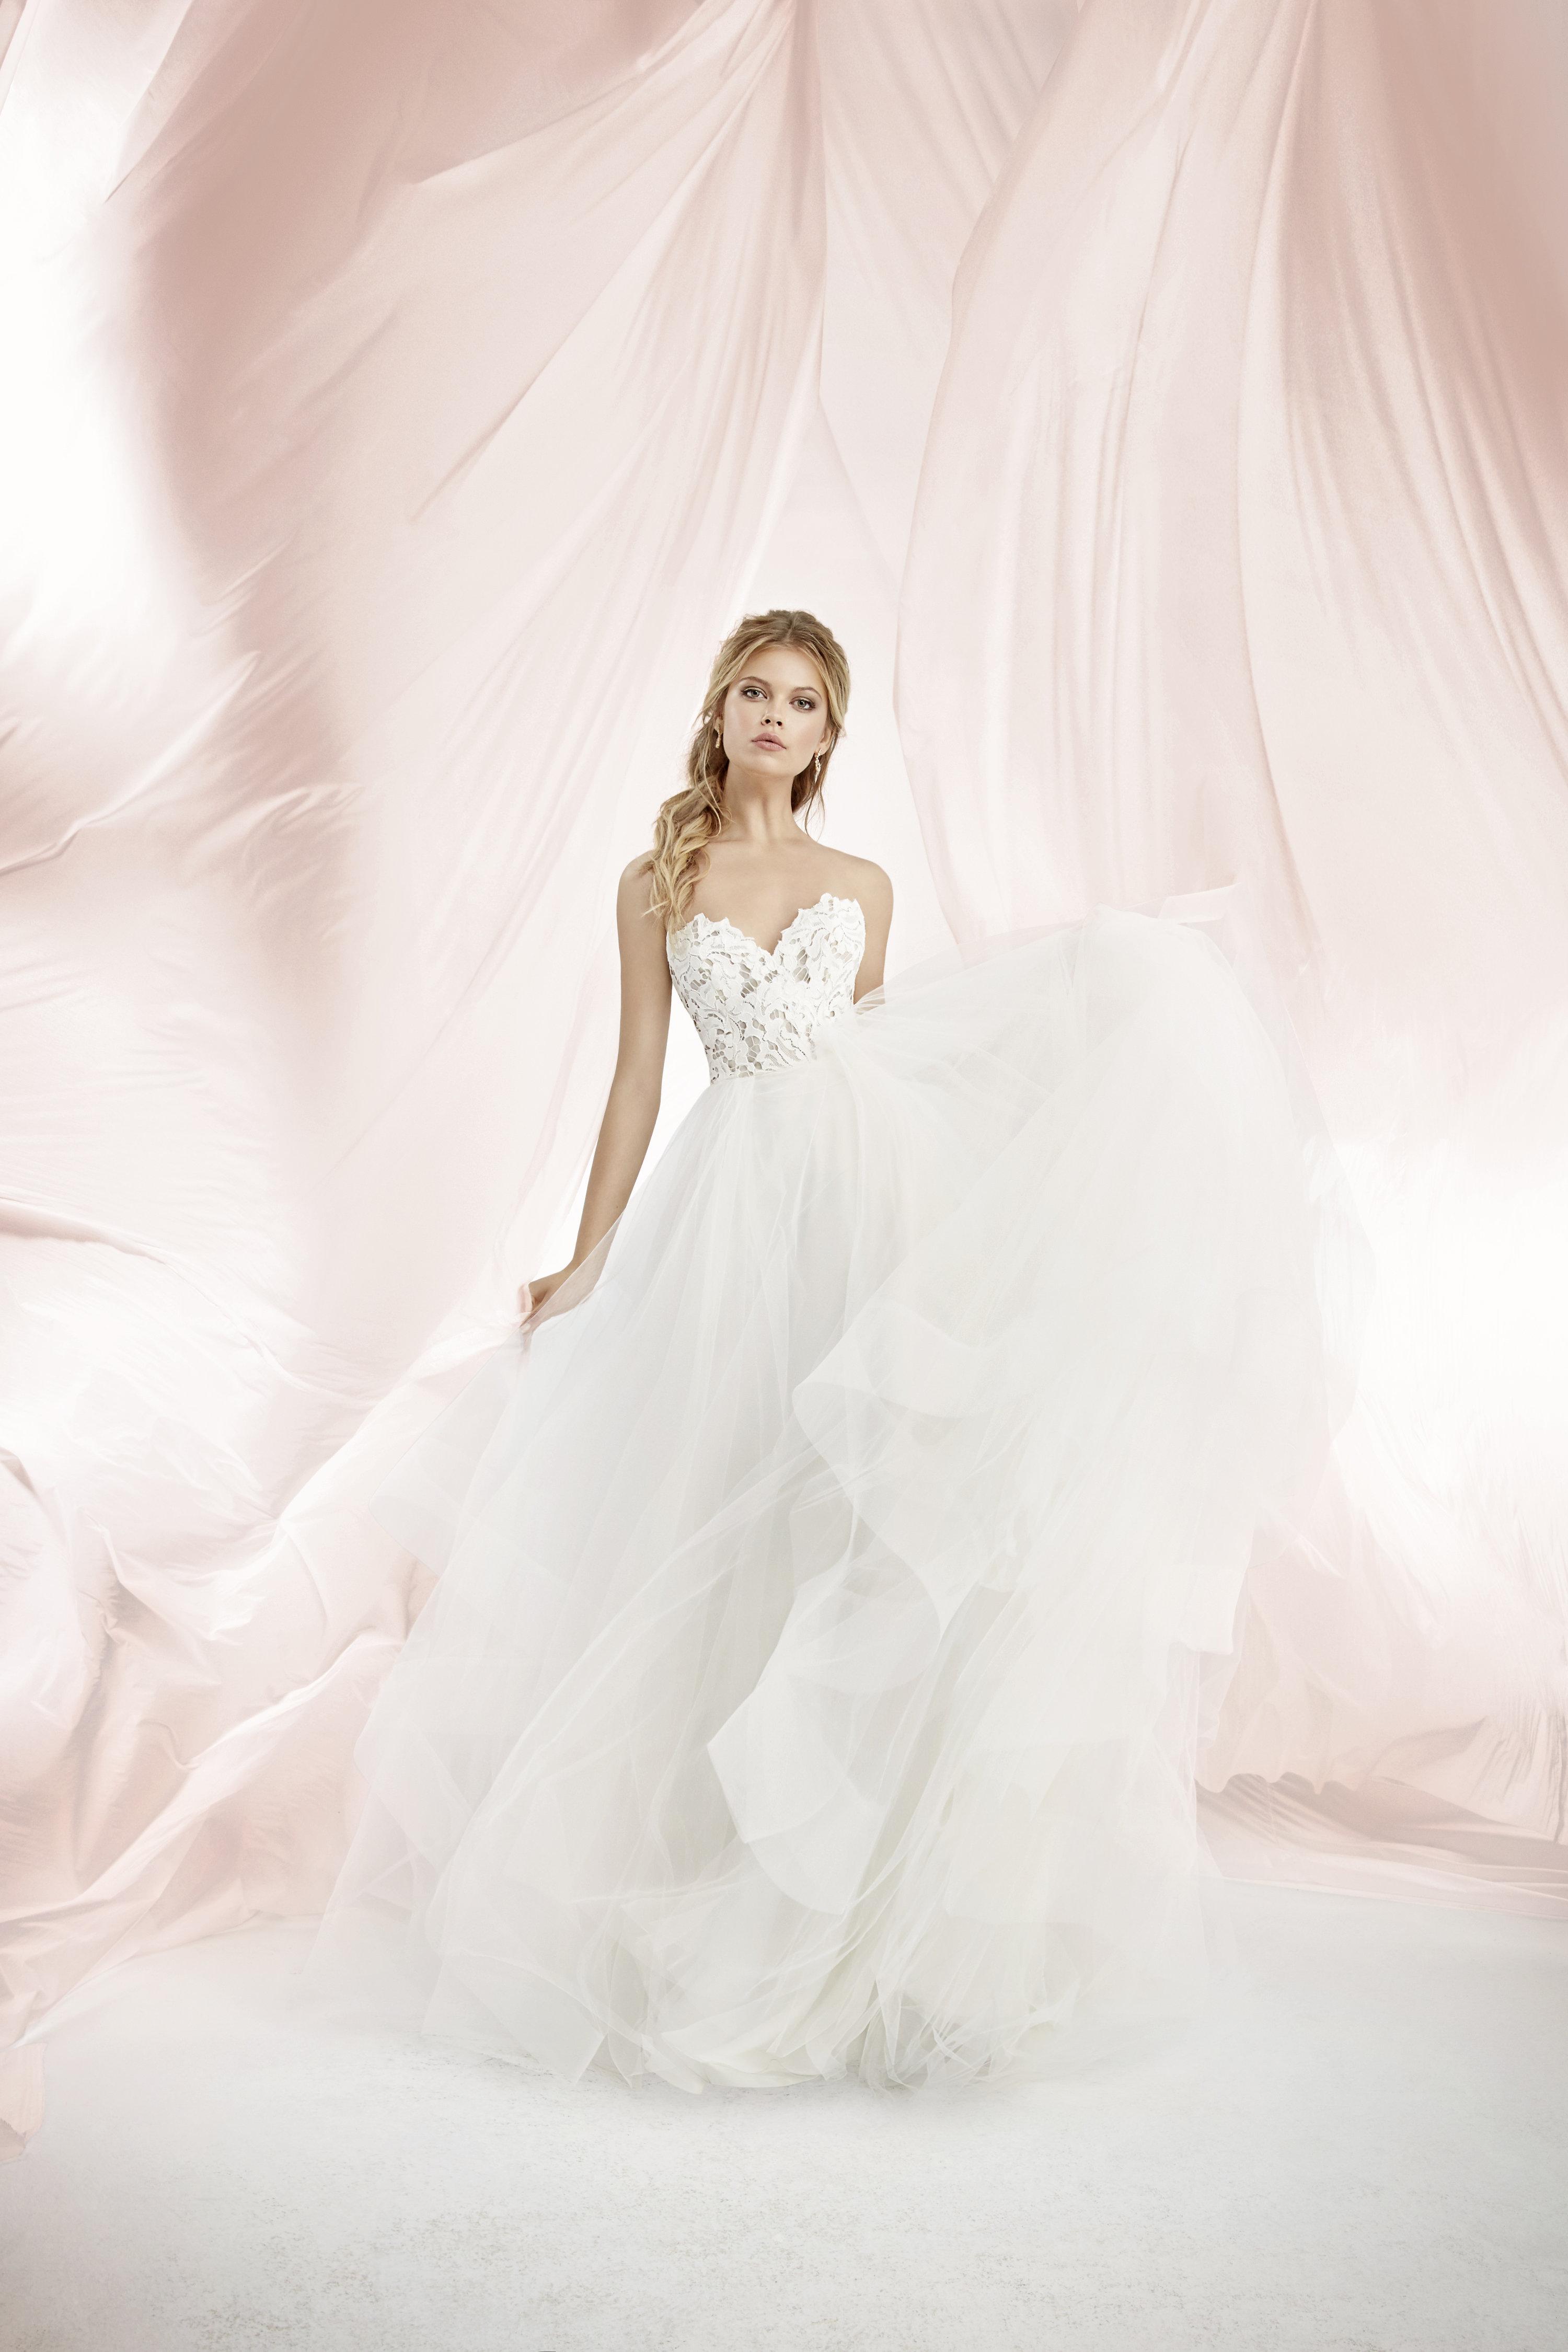 66716d57 Blush by Hayley Paige - Annalise Bridal Boutique : Annalise Bridal ...